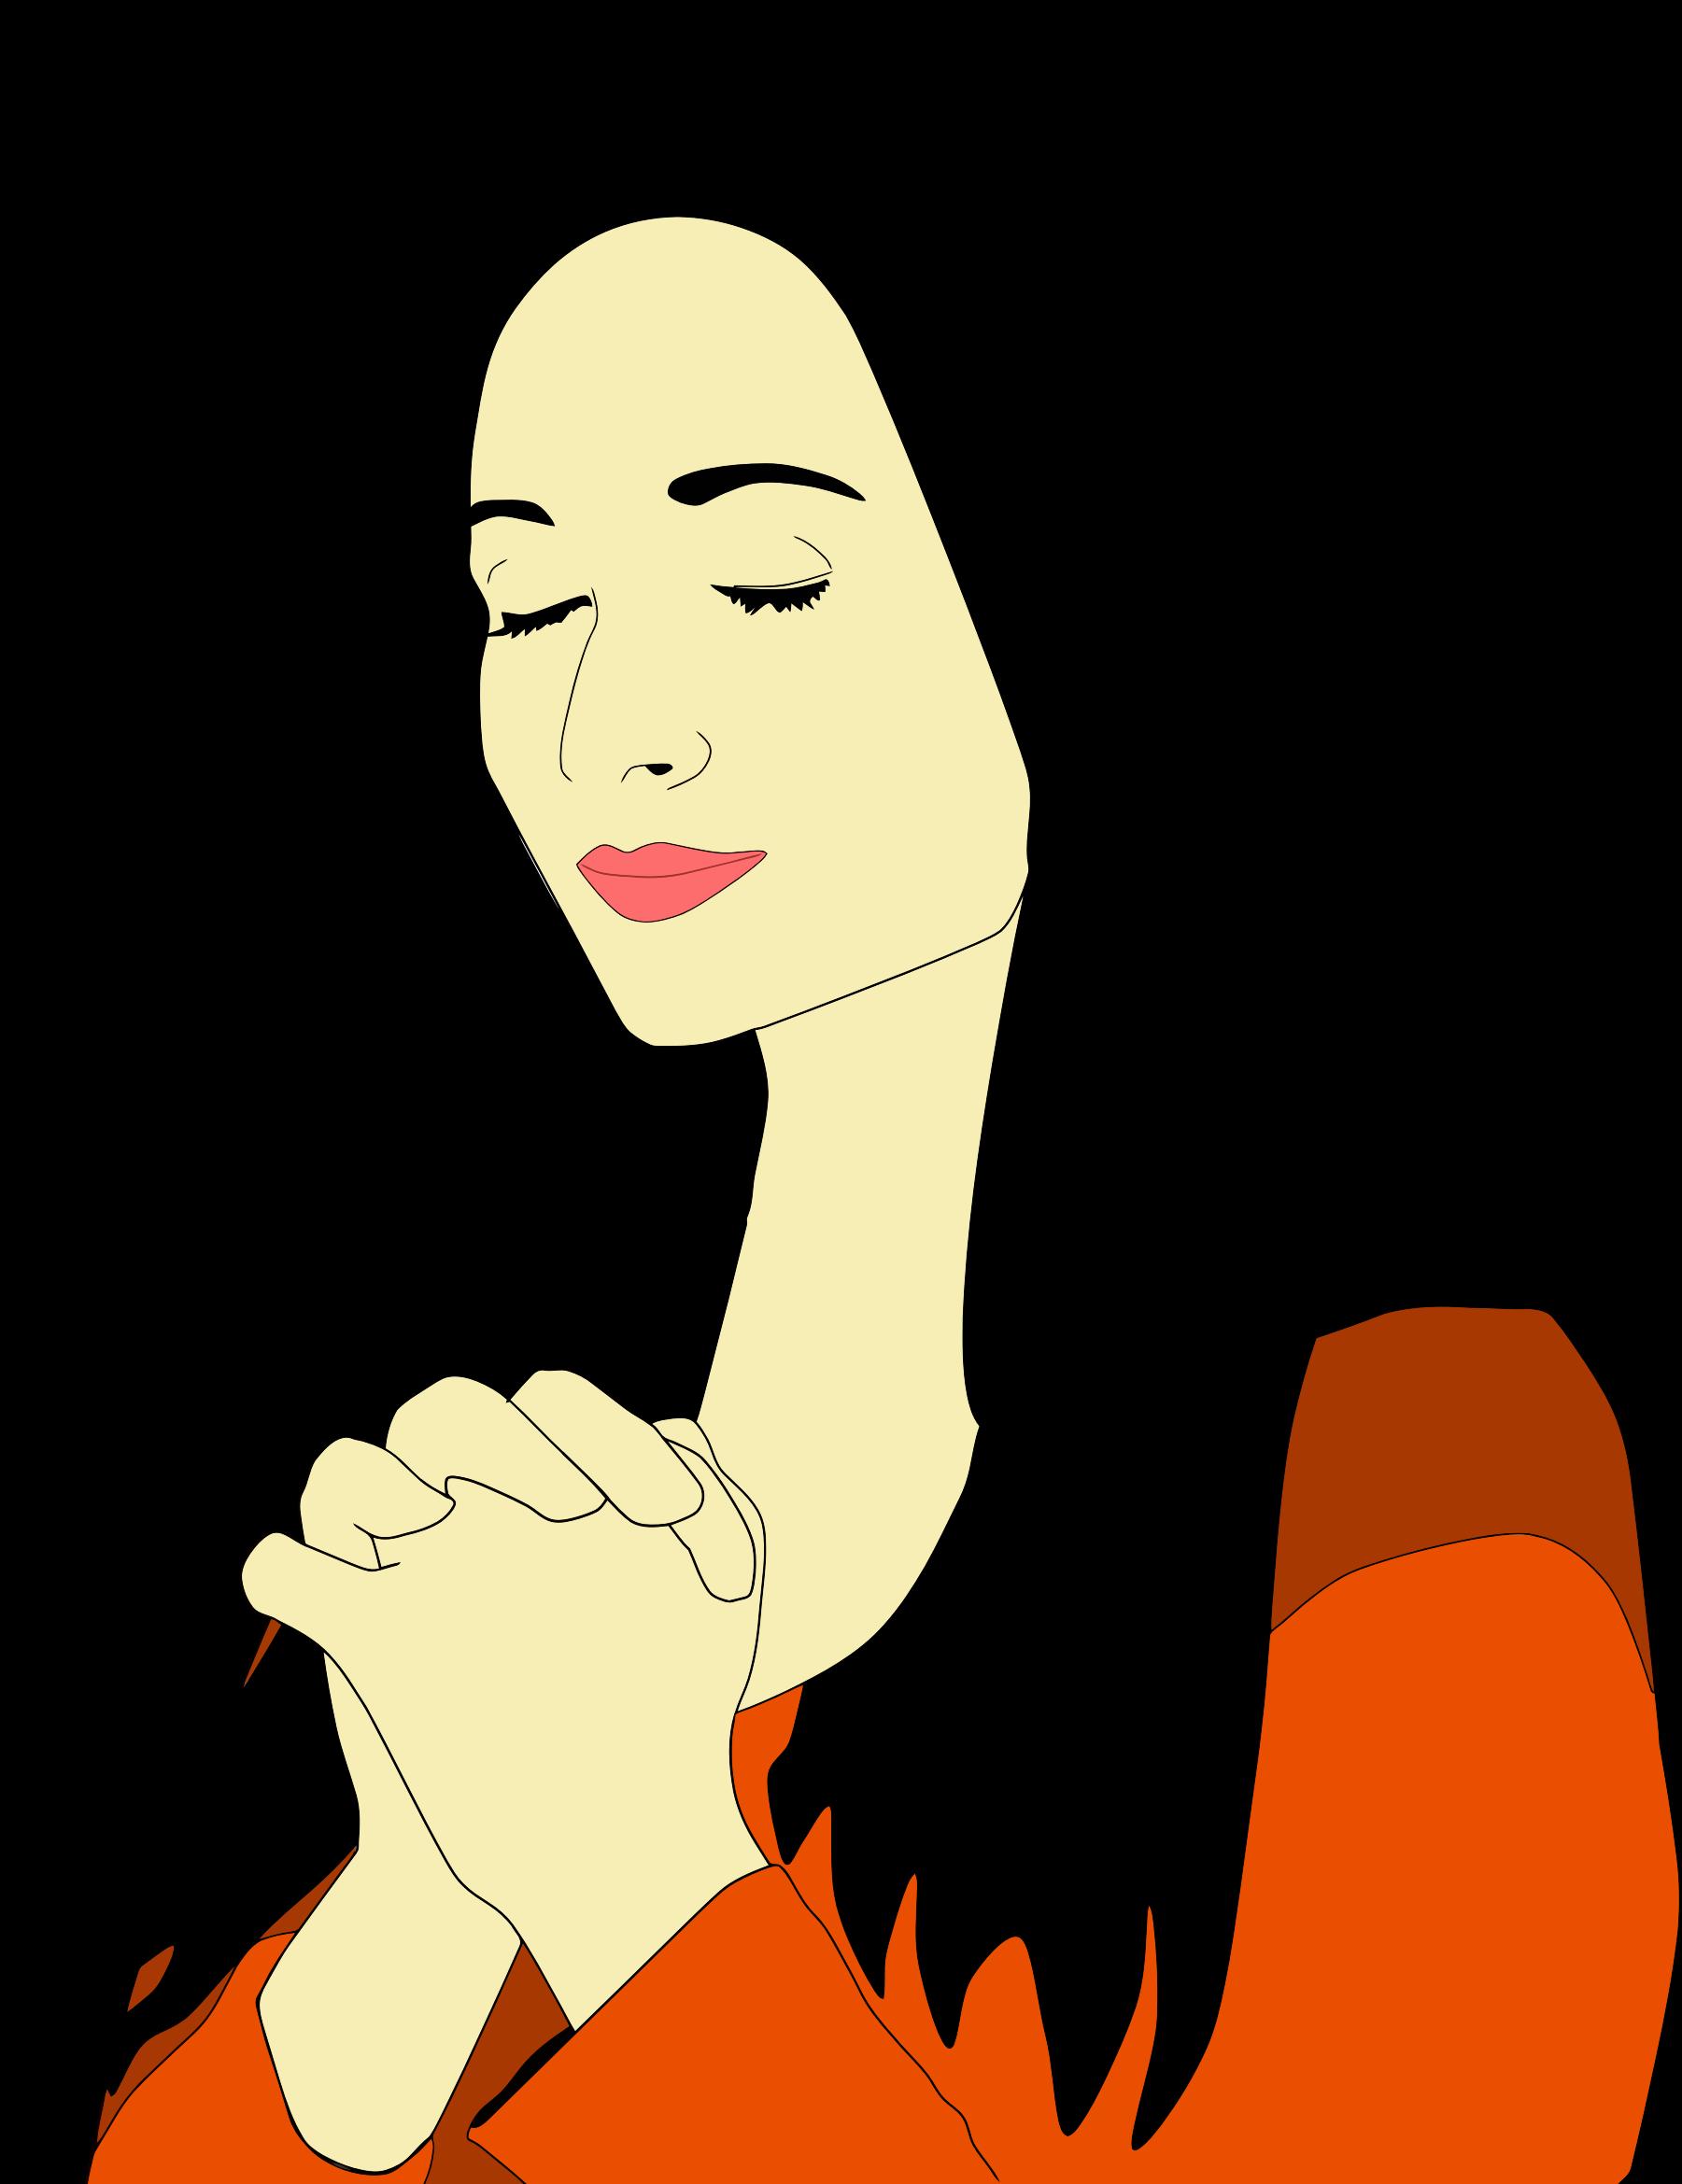 download Silhouette Woman Praying at GetDrawings